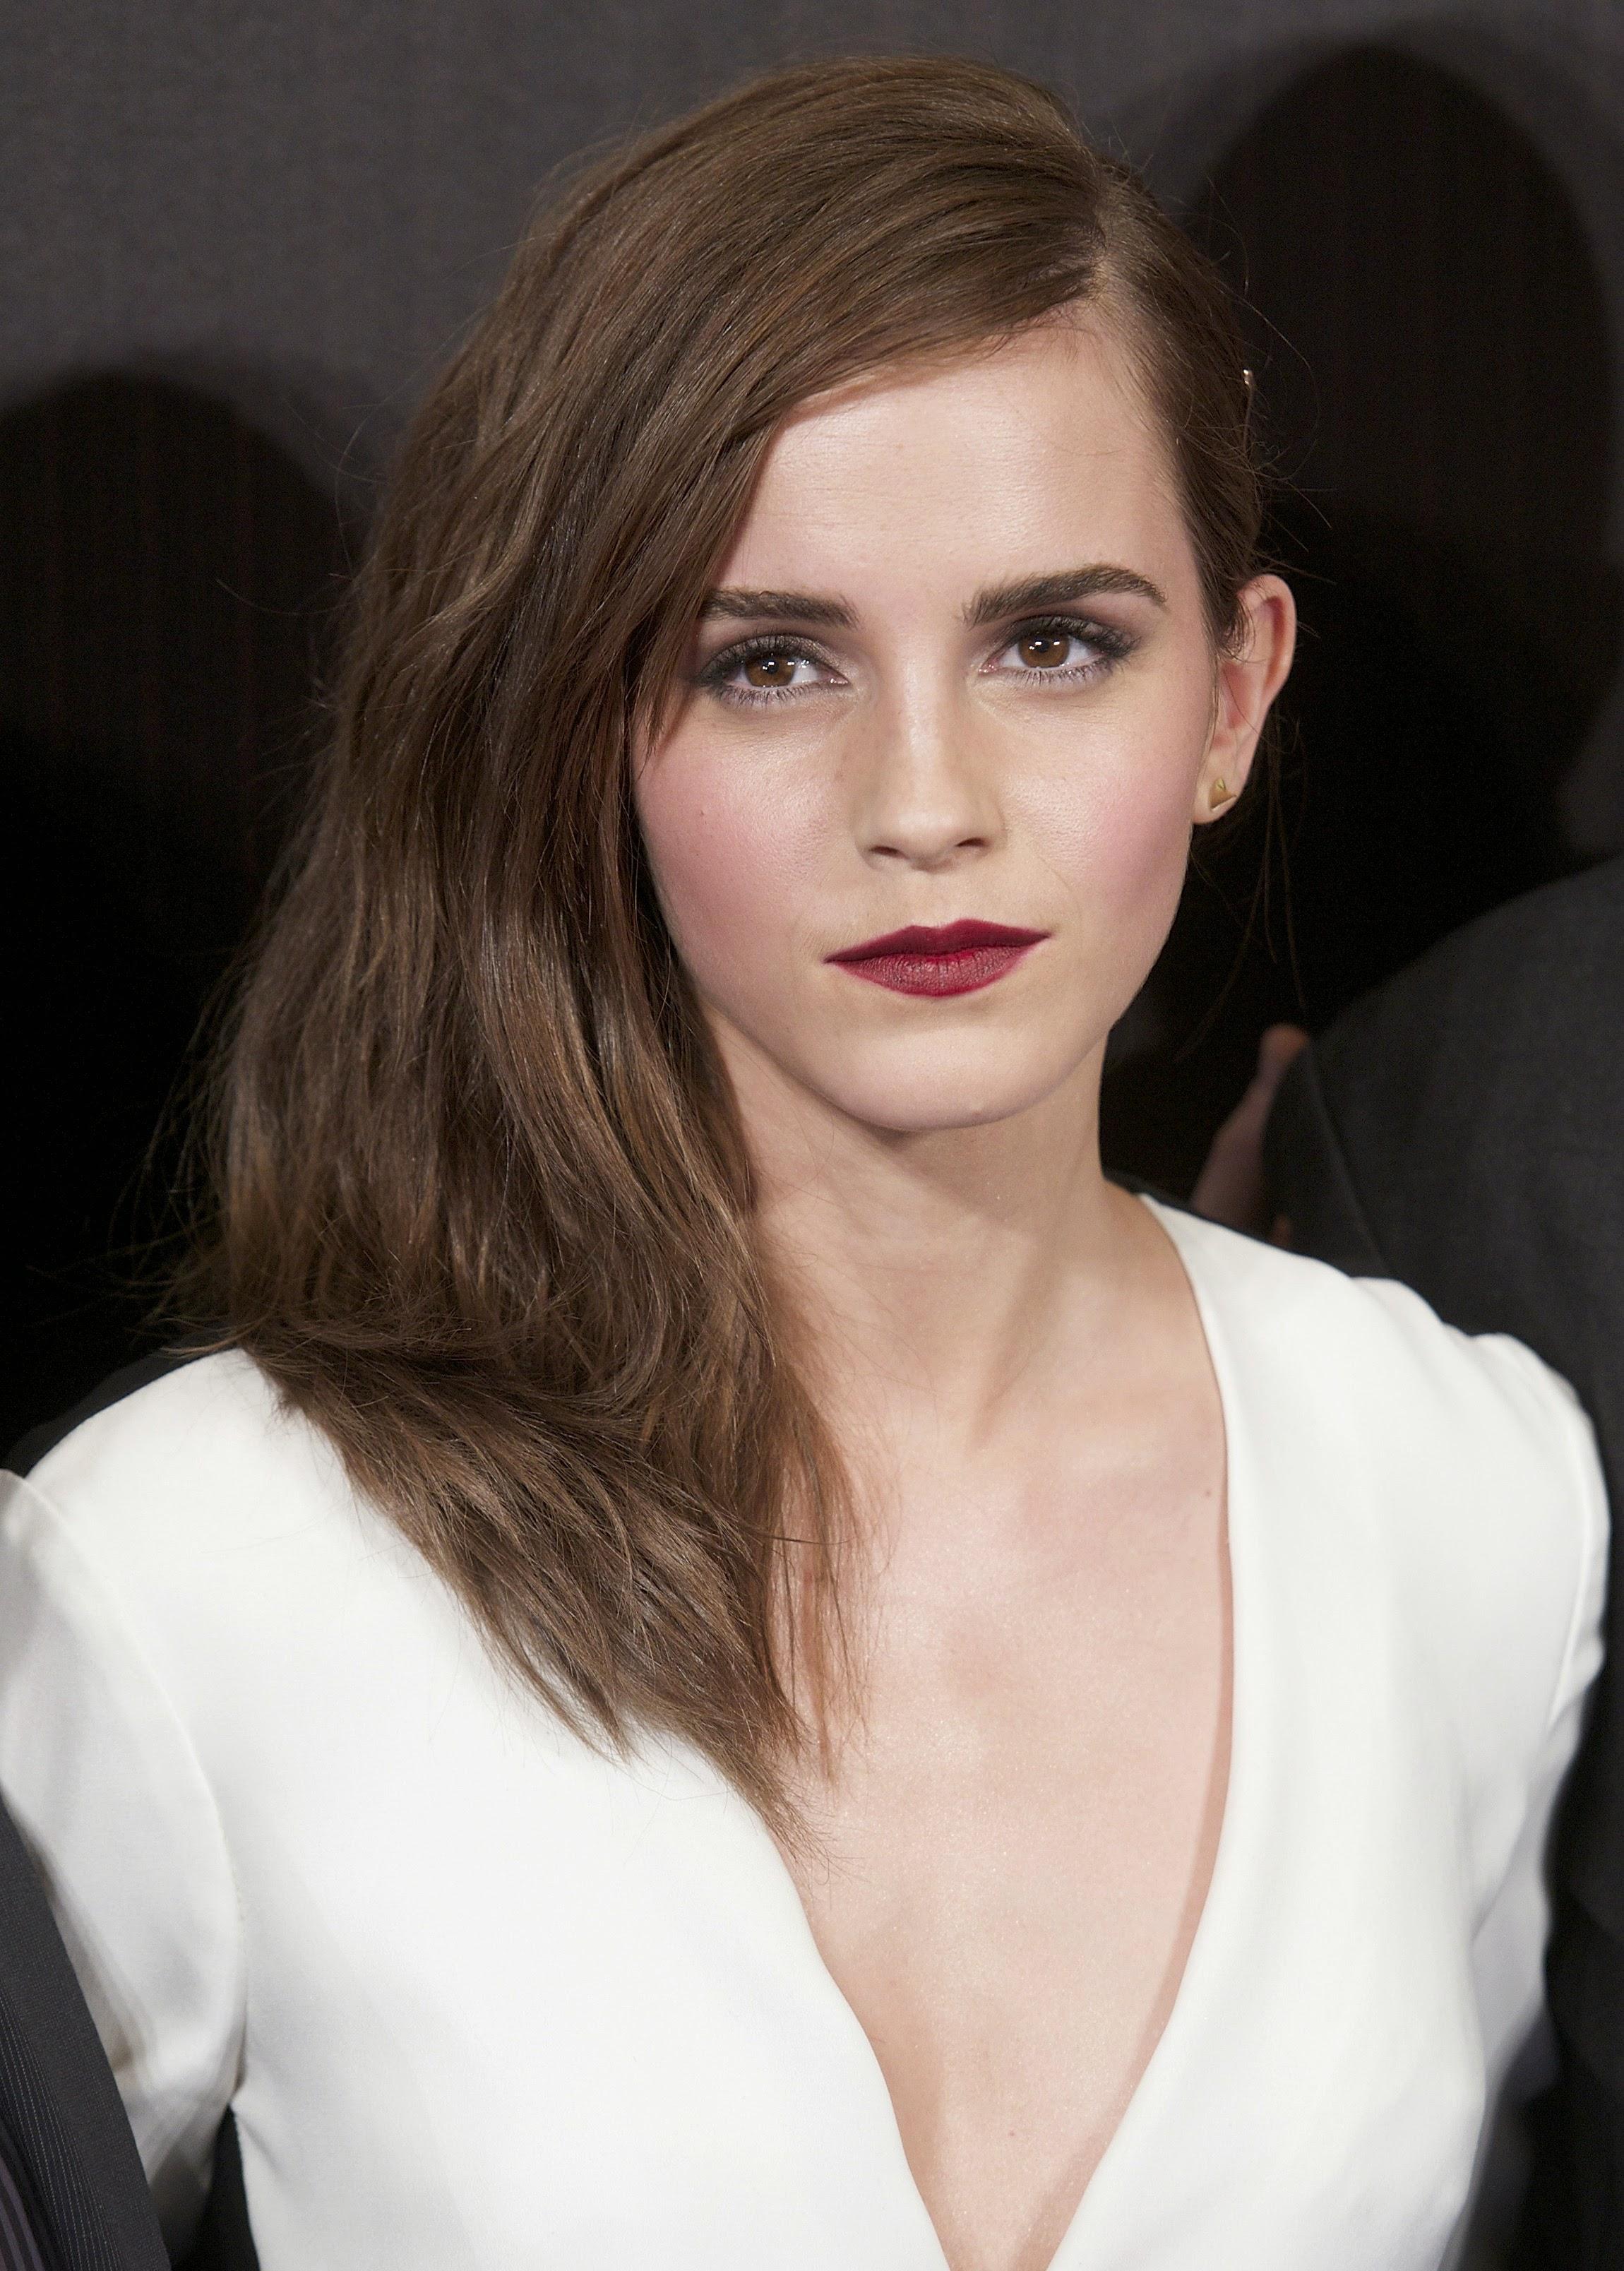 Emma Watson Hollywood Actress 40 Fantastic Photos: Emma Watson Pictures Gallery (9)